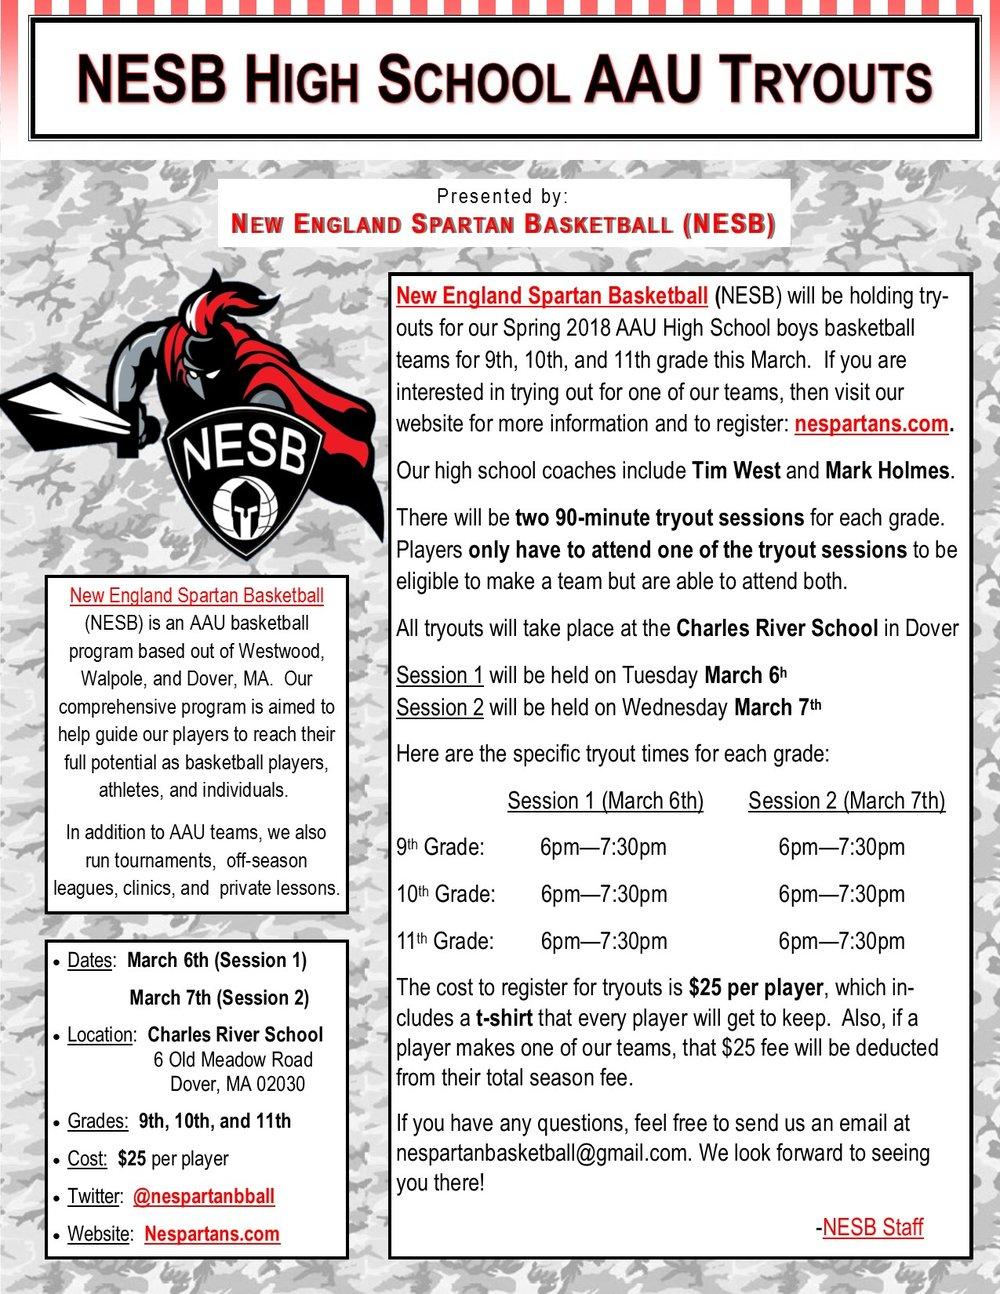 NESB Spring 2018 High School Tryout Flyer.jpg